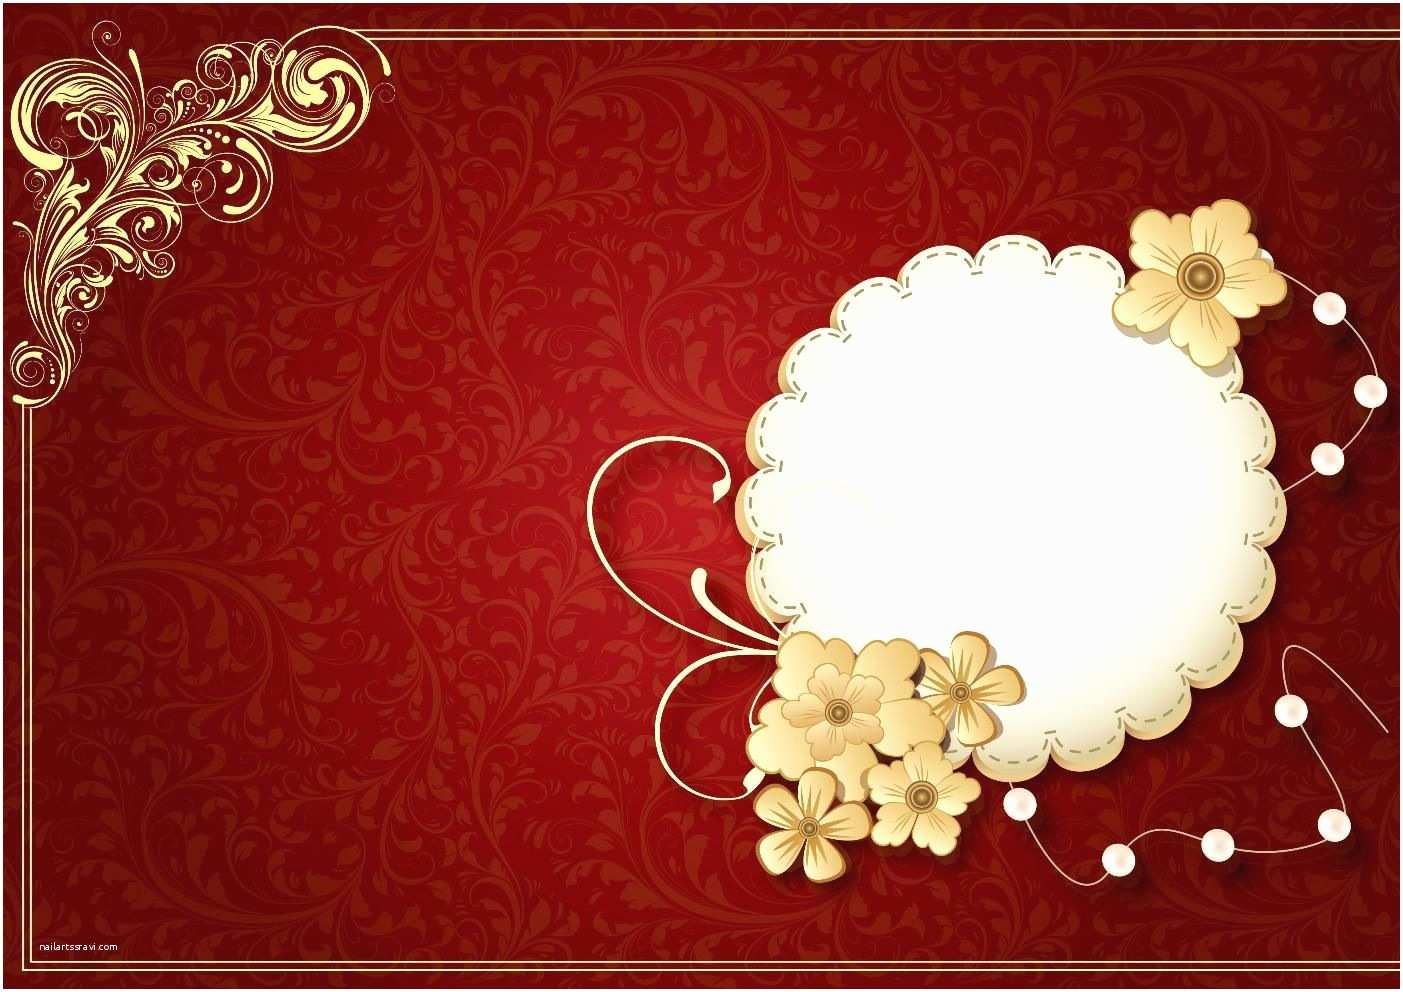 Wedding Invitation Maker with Photo Wedding Invitation Cards Design Blank Marriage Invitation